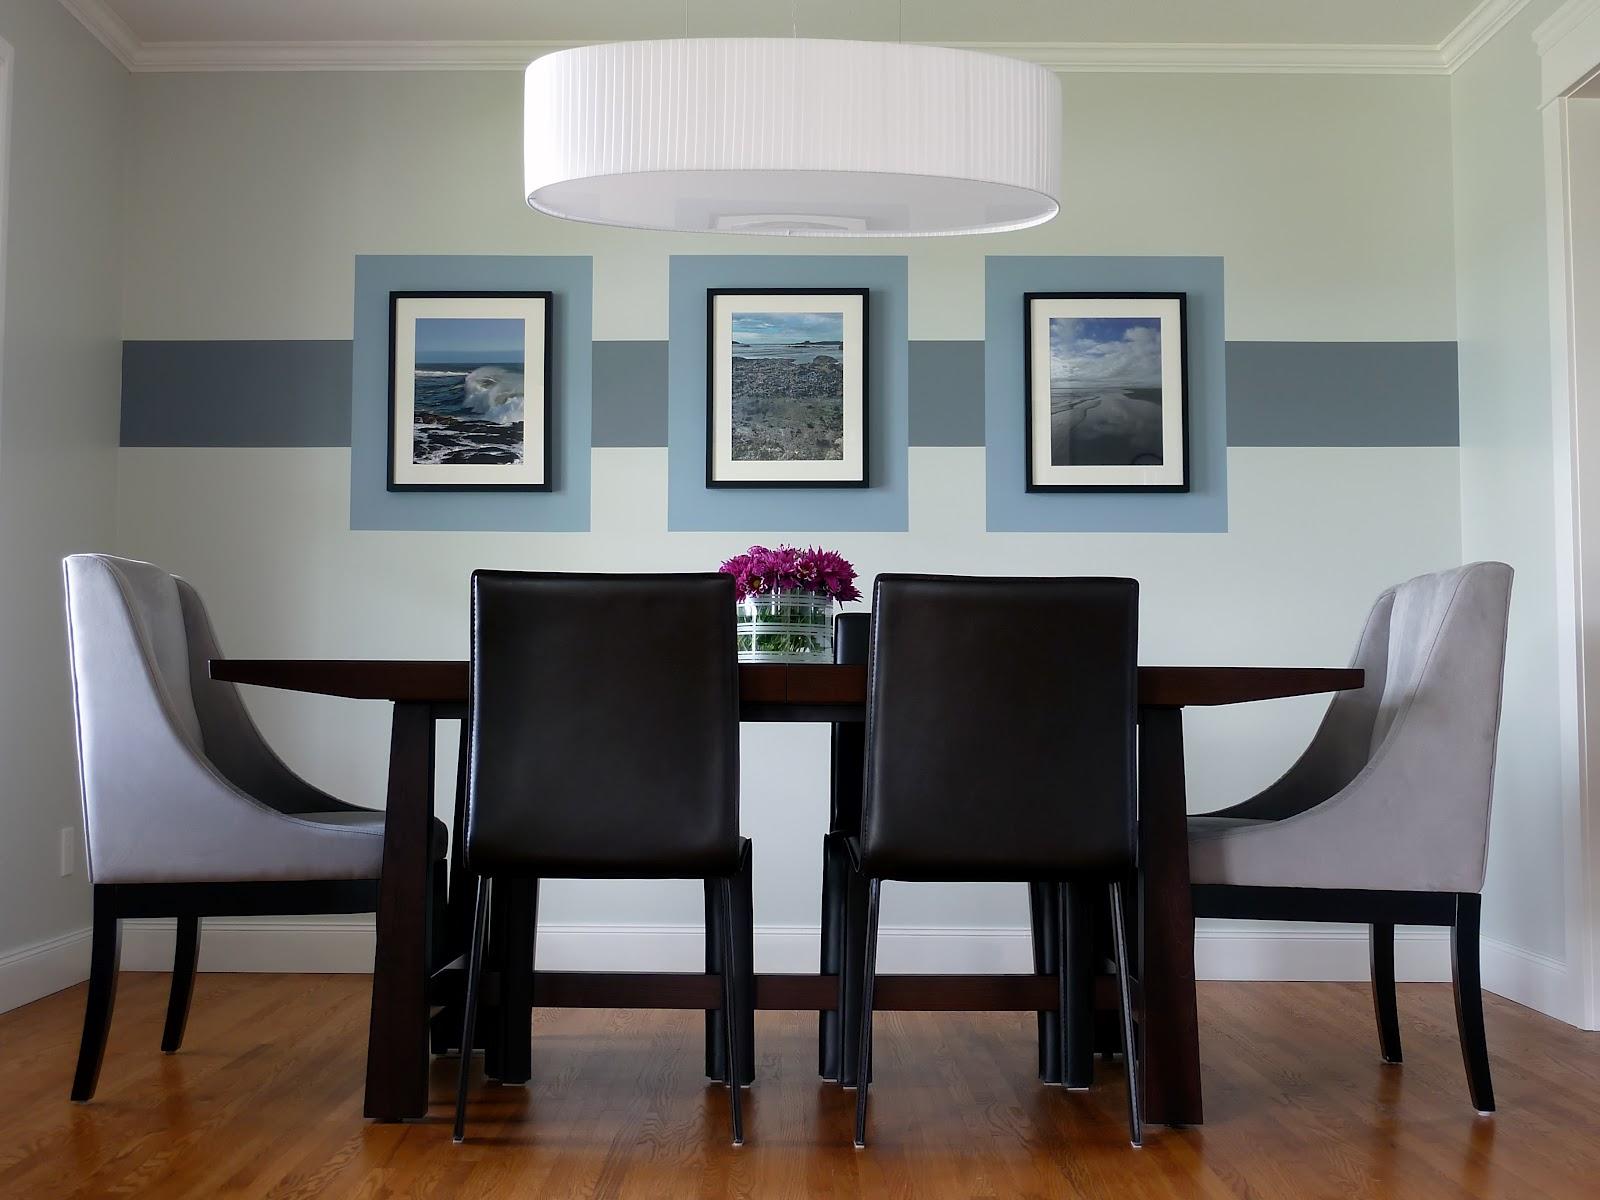 Symmetrical Dining Room Design